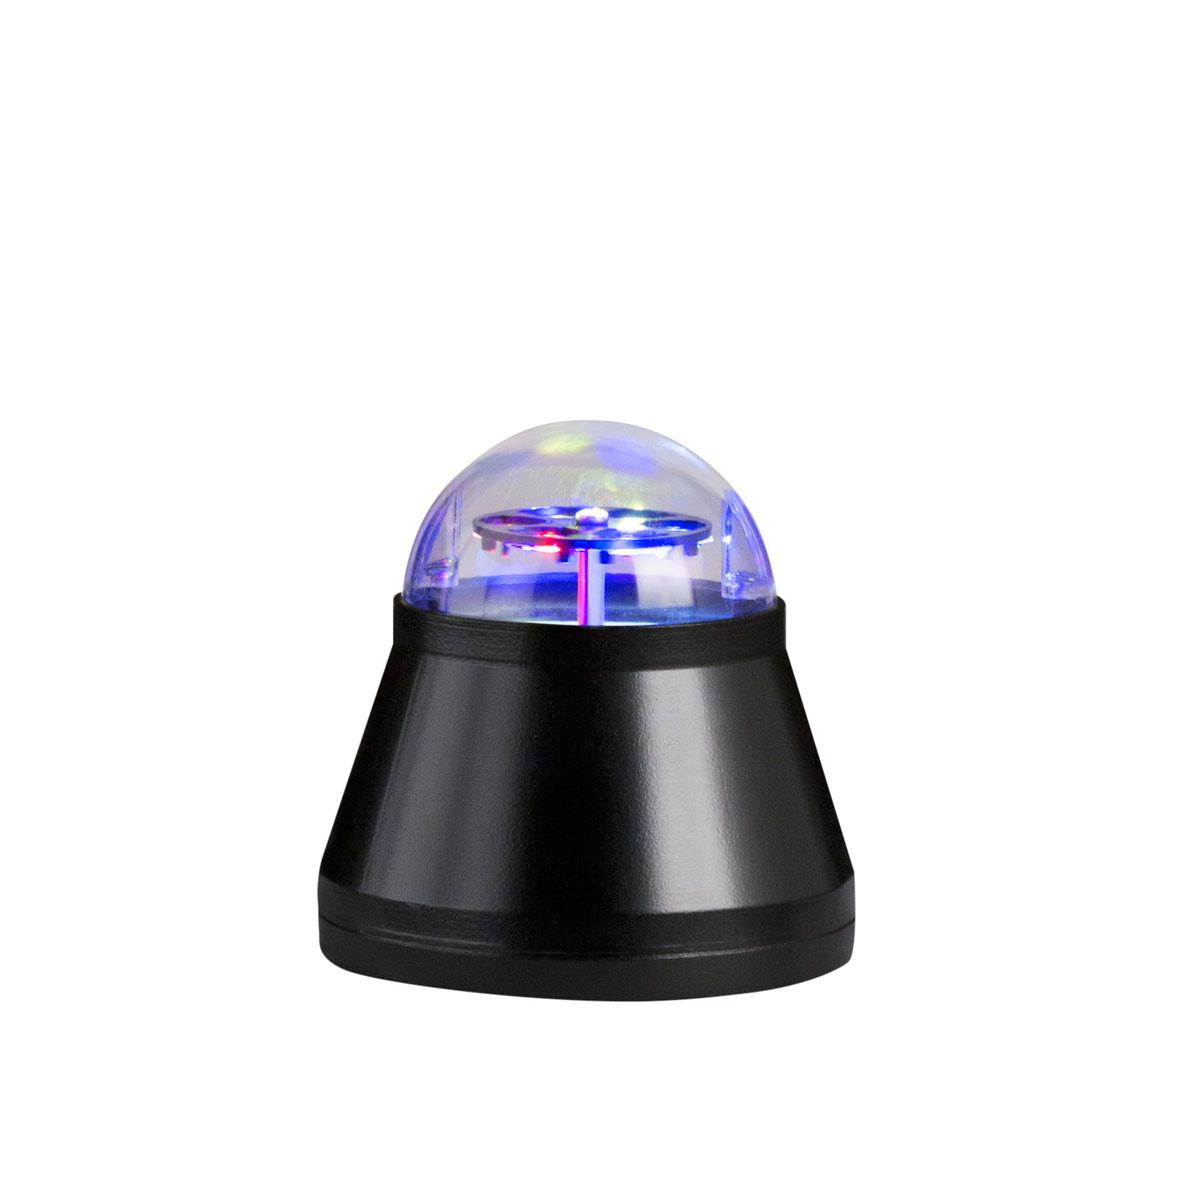 "Dekoleuchten - LED Dekoleuchte ""Silvester"", schwarz  - Onlineshop Hellweg"